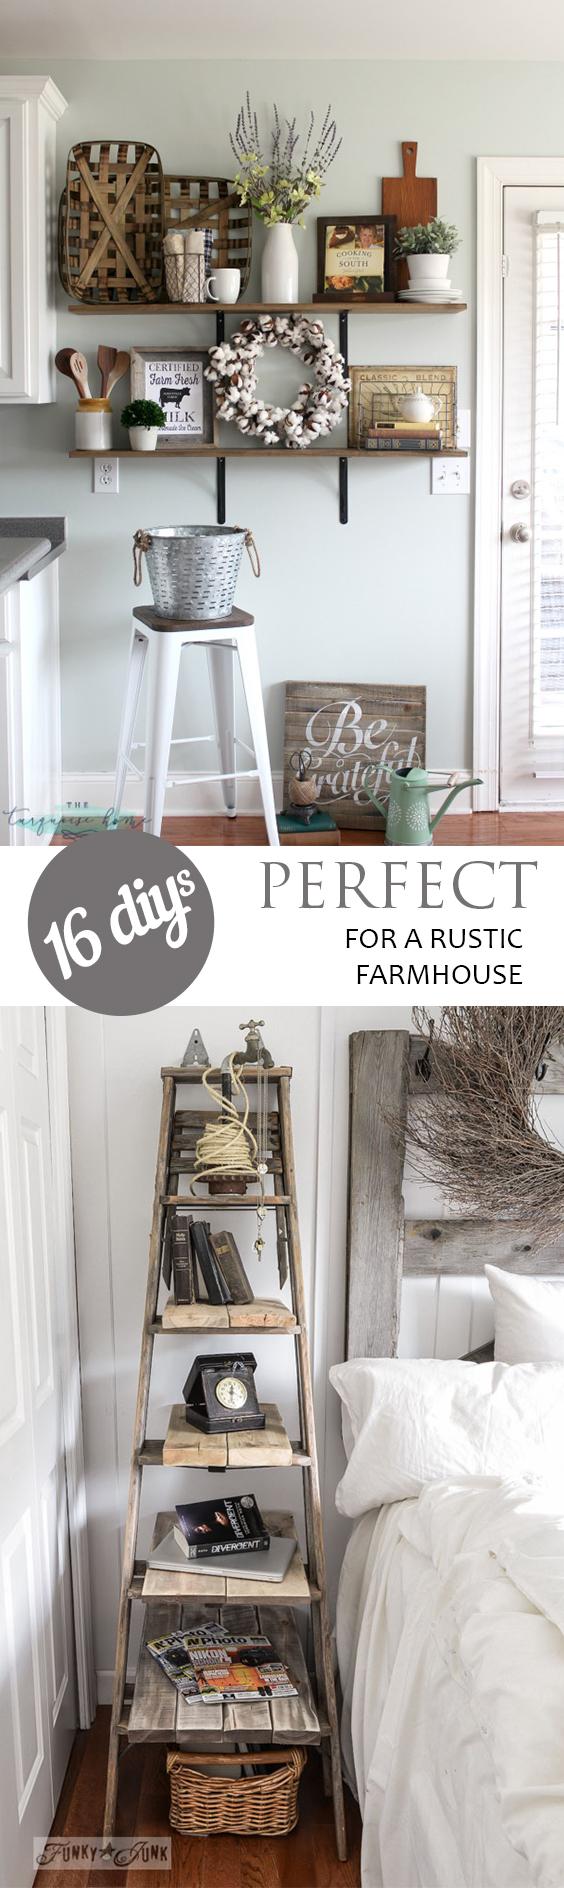 Rustic Home, Home Decor, Home DIY, Rustic Home DIY, Popular Pin, DIY Home Decor, DIY Rustic Decor For the Home, Easy Home DIY, DIY Projects for the Home, Home Decor Ideas, Home DIY Projects, Rustic Home Decor, Easy Home DIY Projects, Easy DIY Home Decor #rustichome #rustichomedecor #homedecor #diyhomedecor #homedecorprojects #easyDIYhomedecor